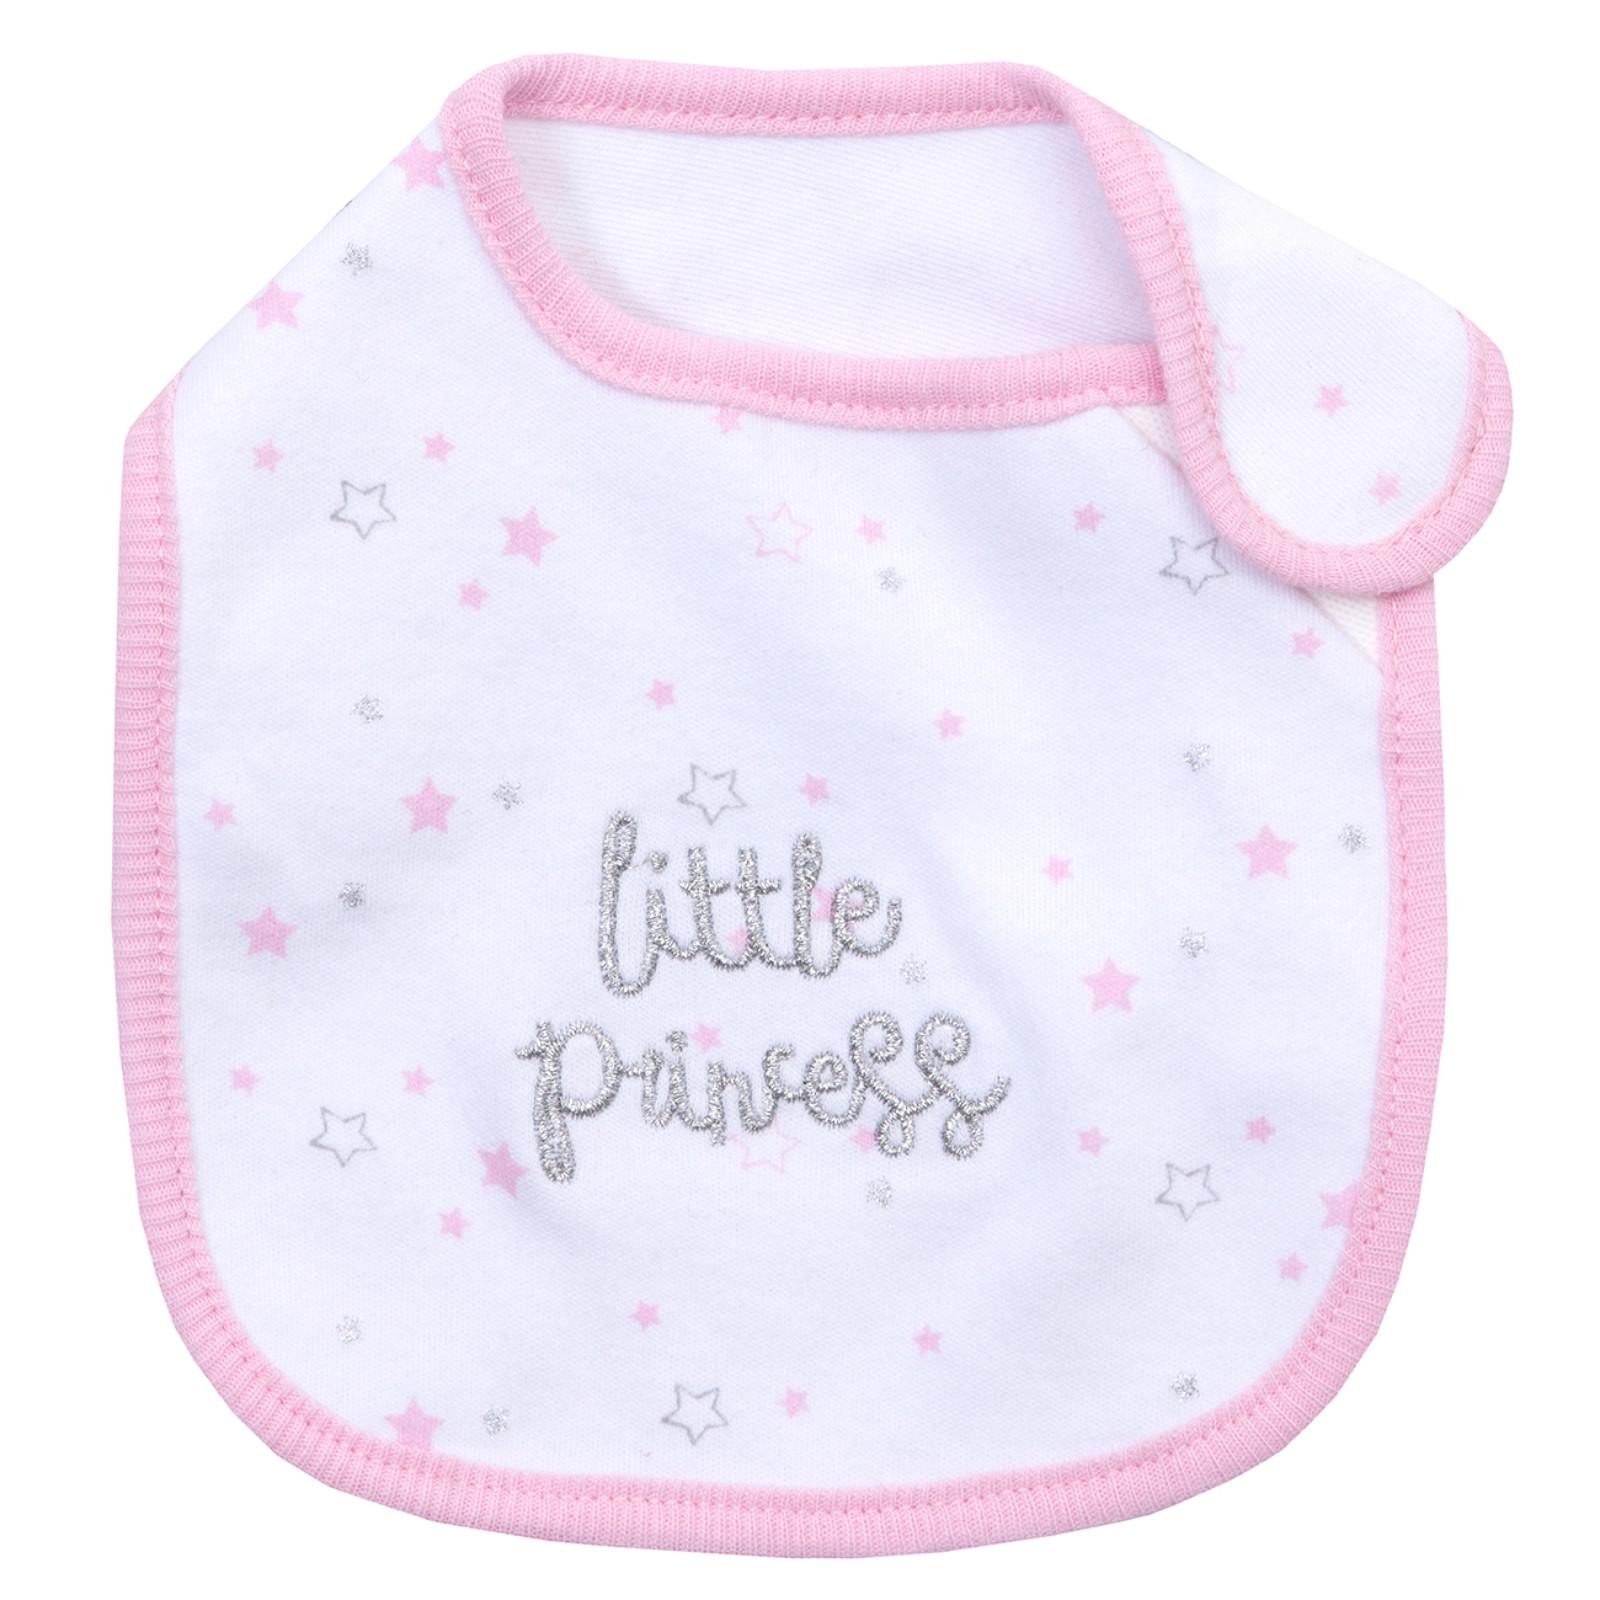 Baby Girls Little Princess Babygrow Hat Bib 3 Piece Set Outfit Newborn Gift